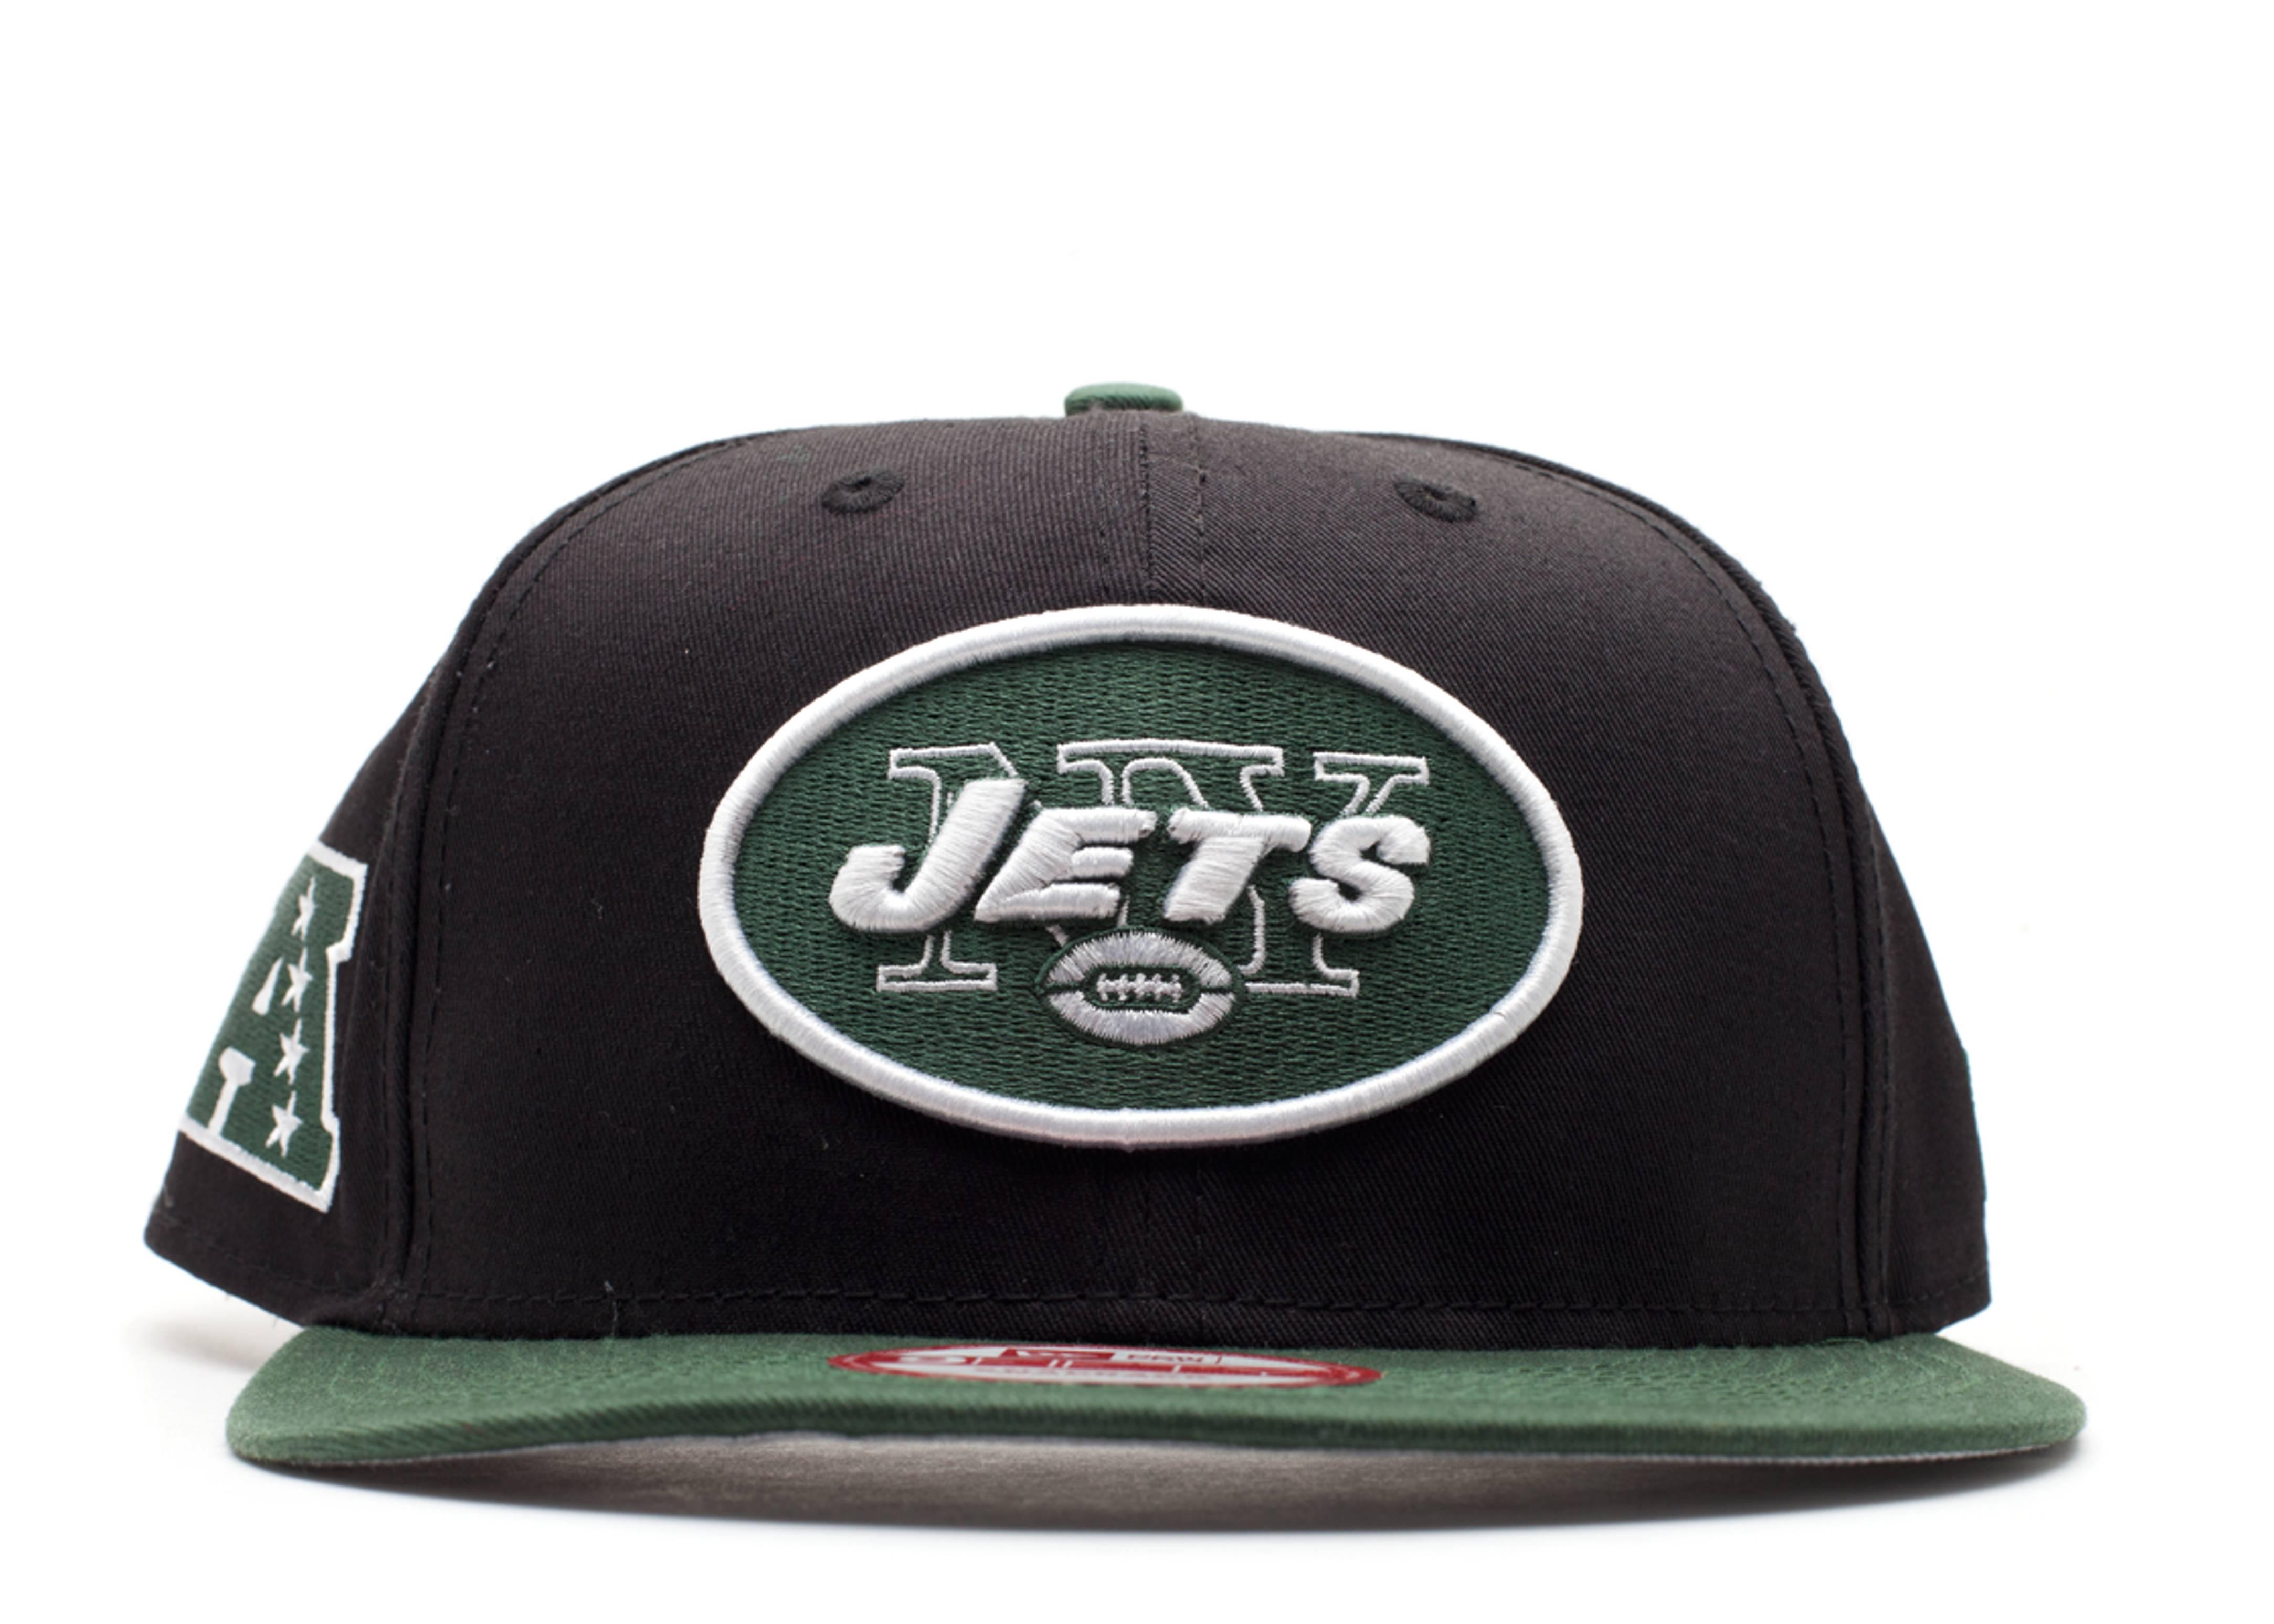 e4f564bf20e New York Jets Snap-back - New Era - 10581390 - green black